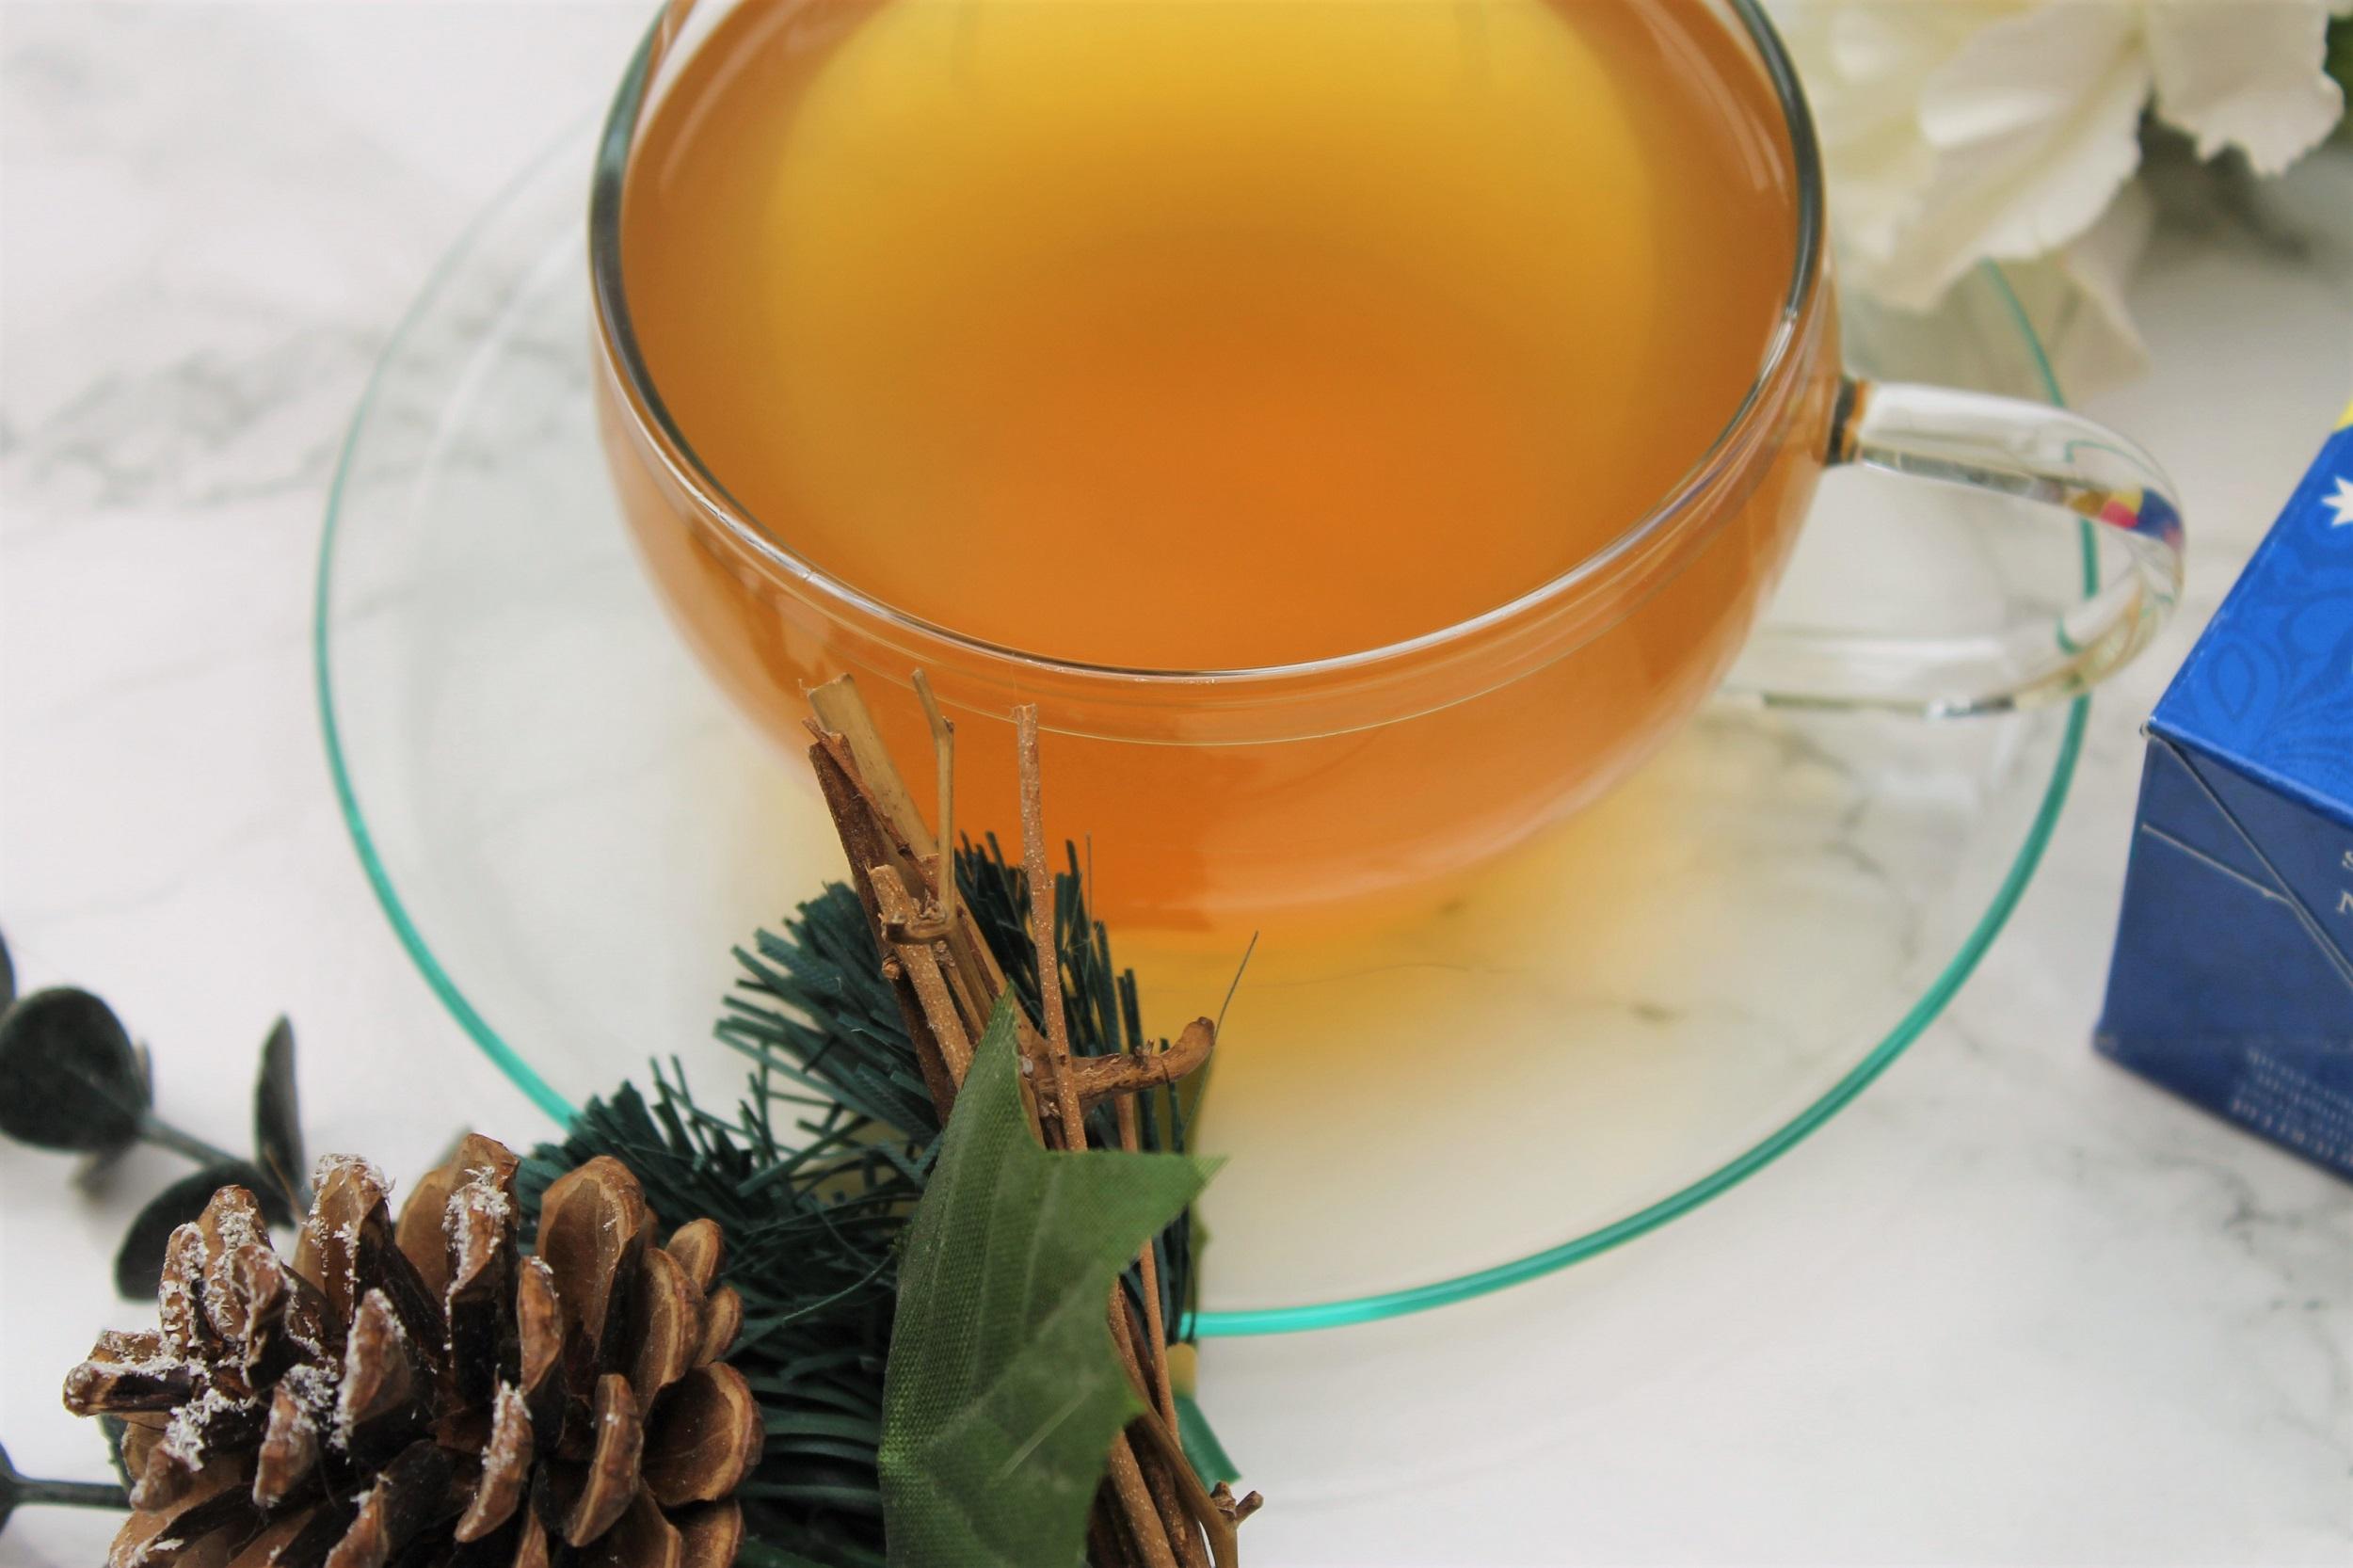 white wonderland brewed in glass teacup